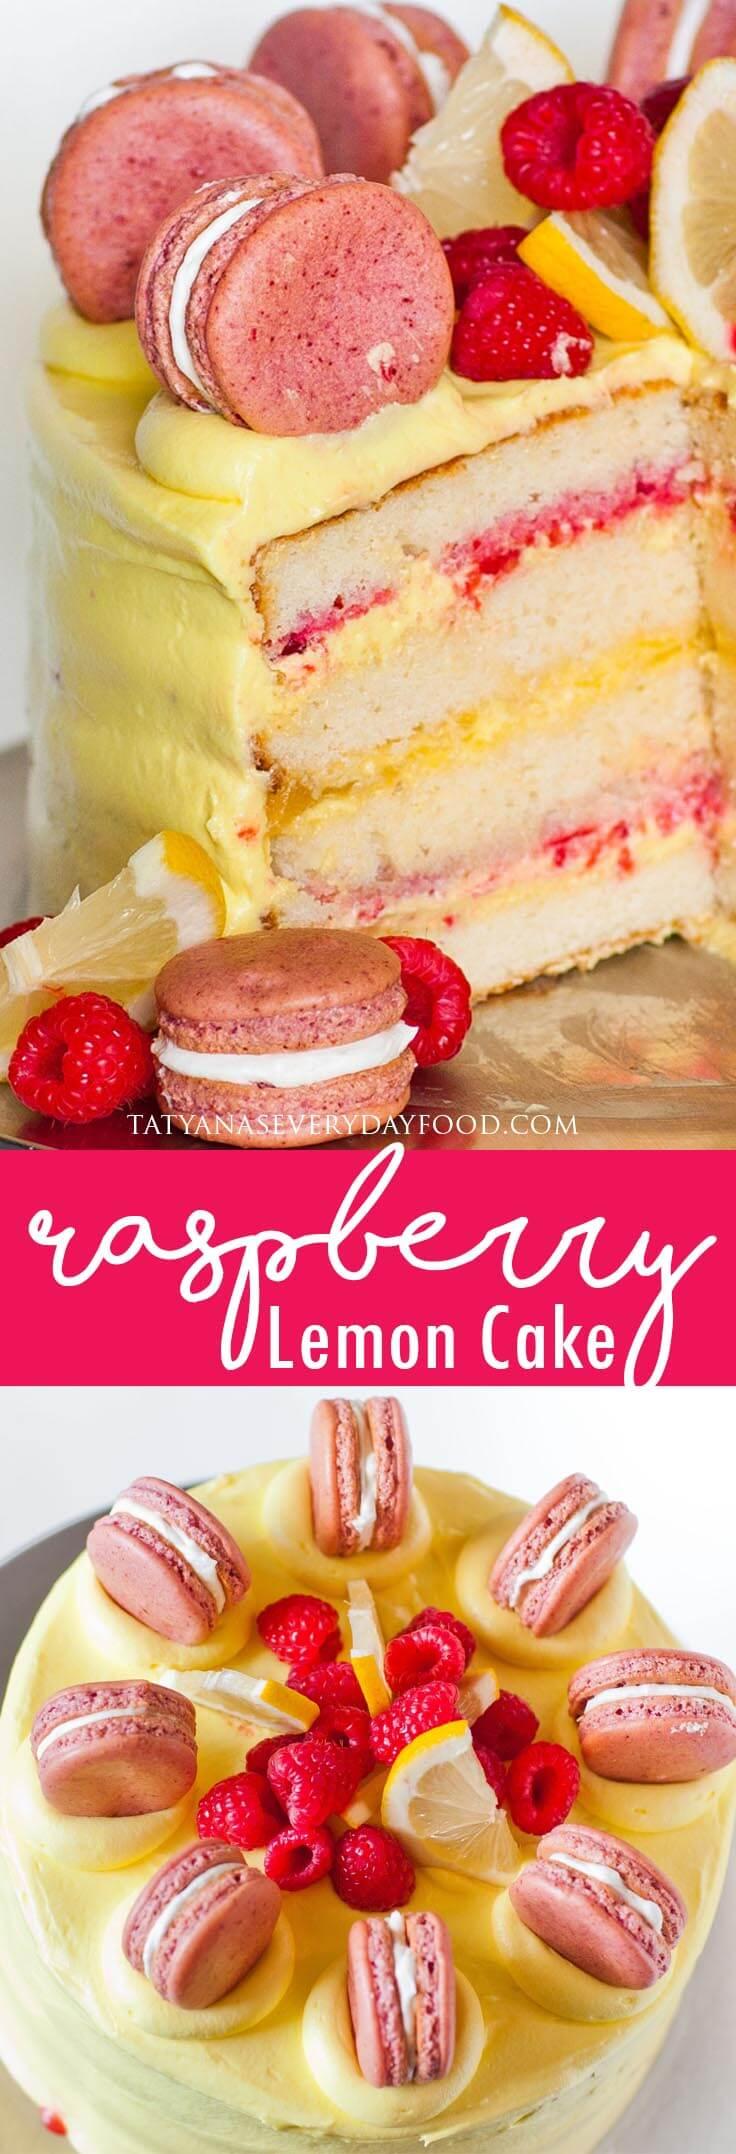 Raspberry Lemon Cake video recipe